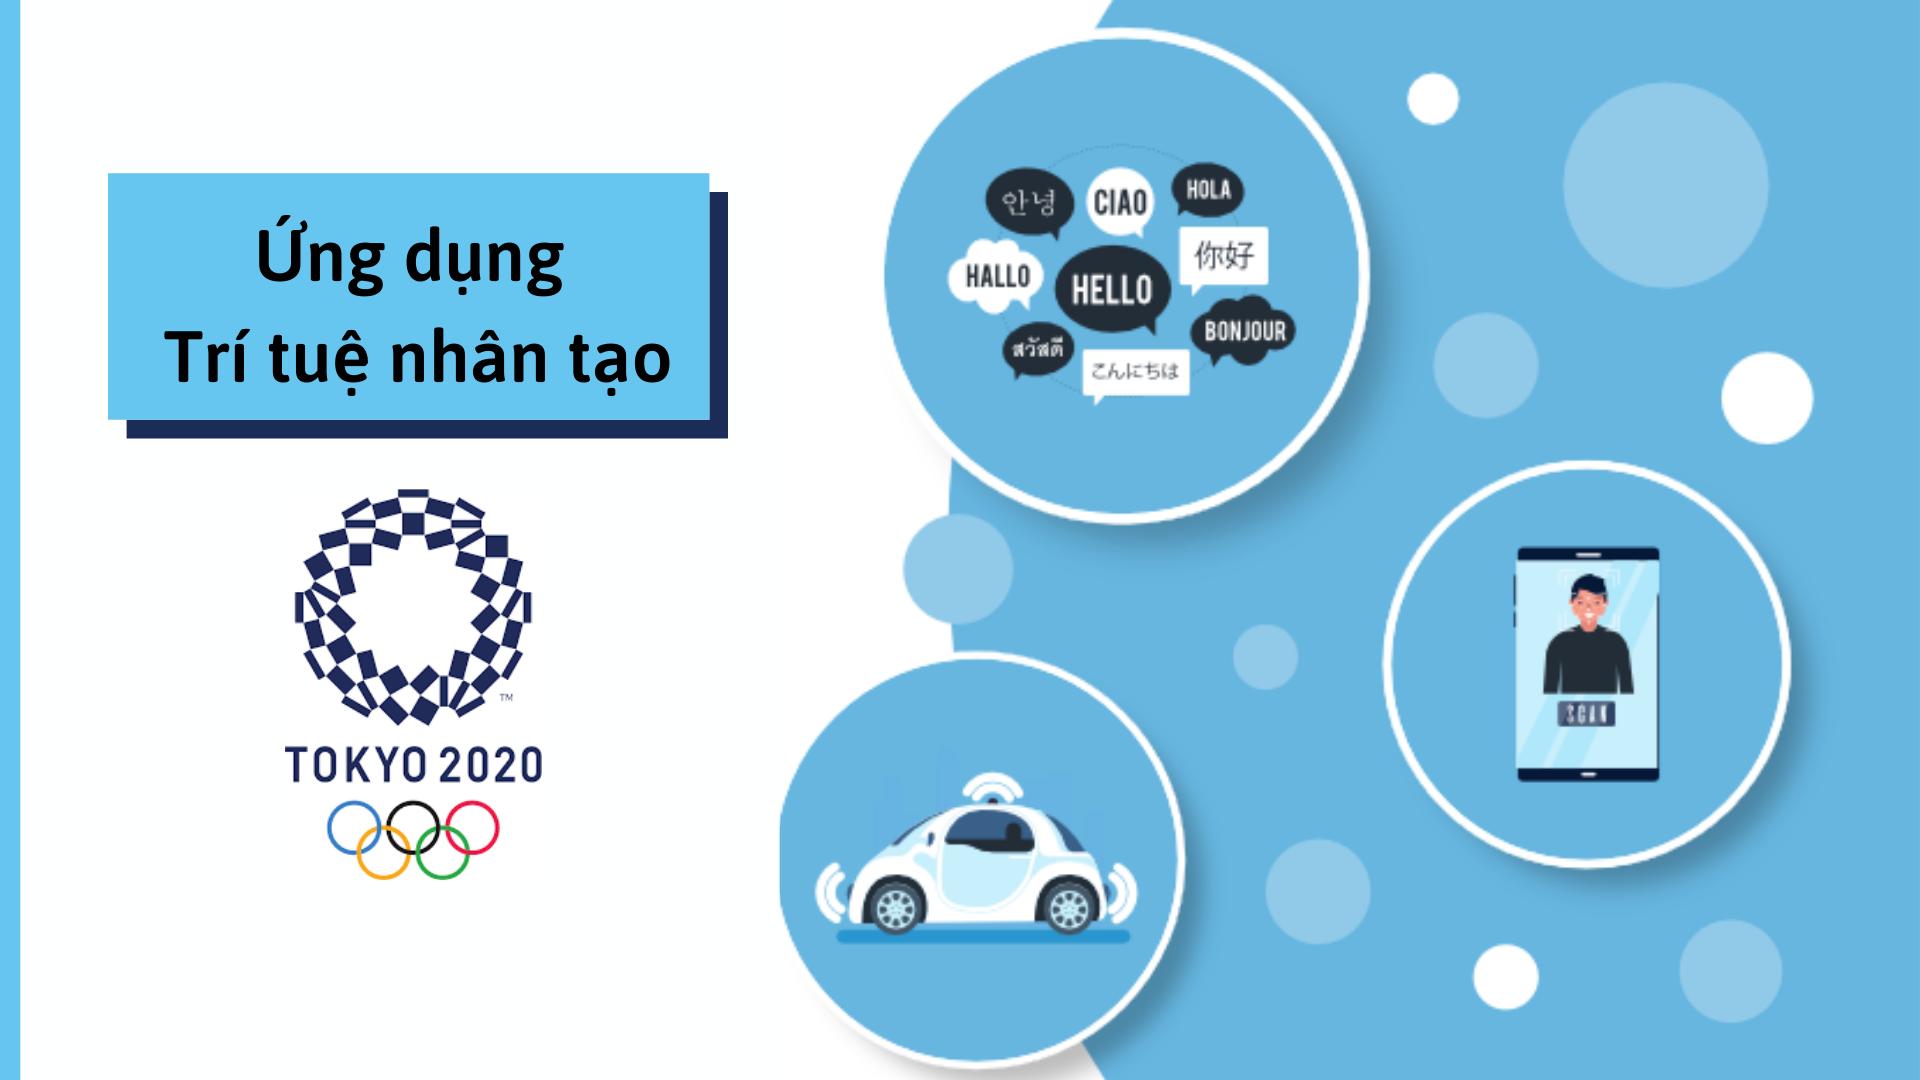 ung-dung-tri-tue-nhan-tao-tai-olympic-2020